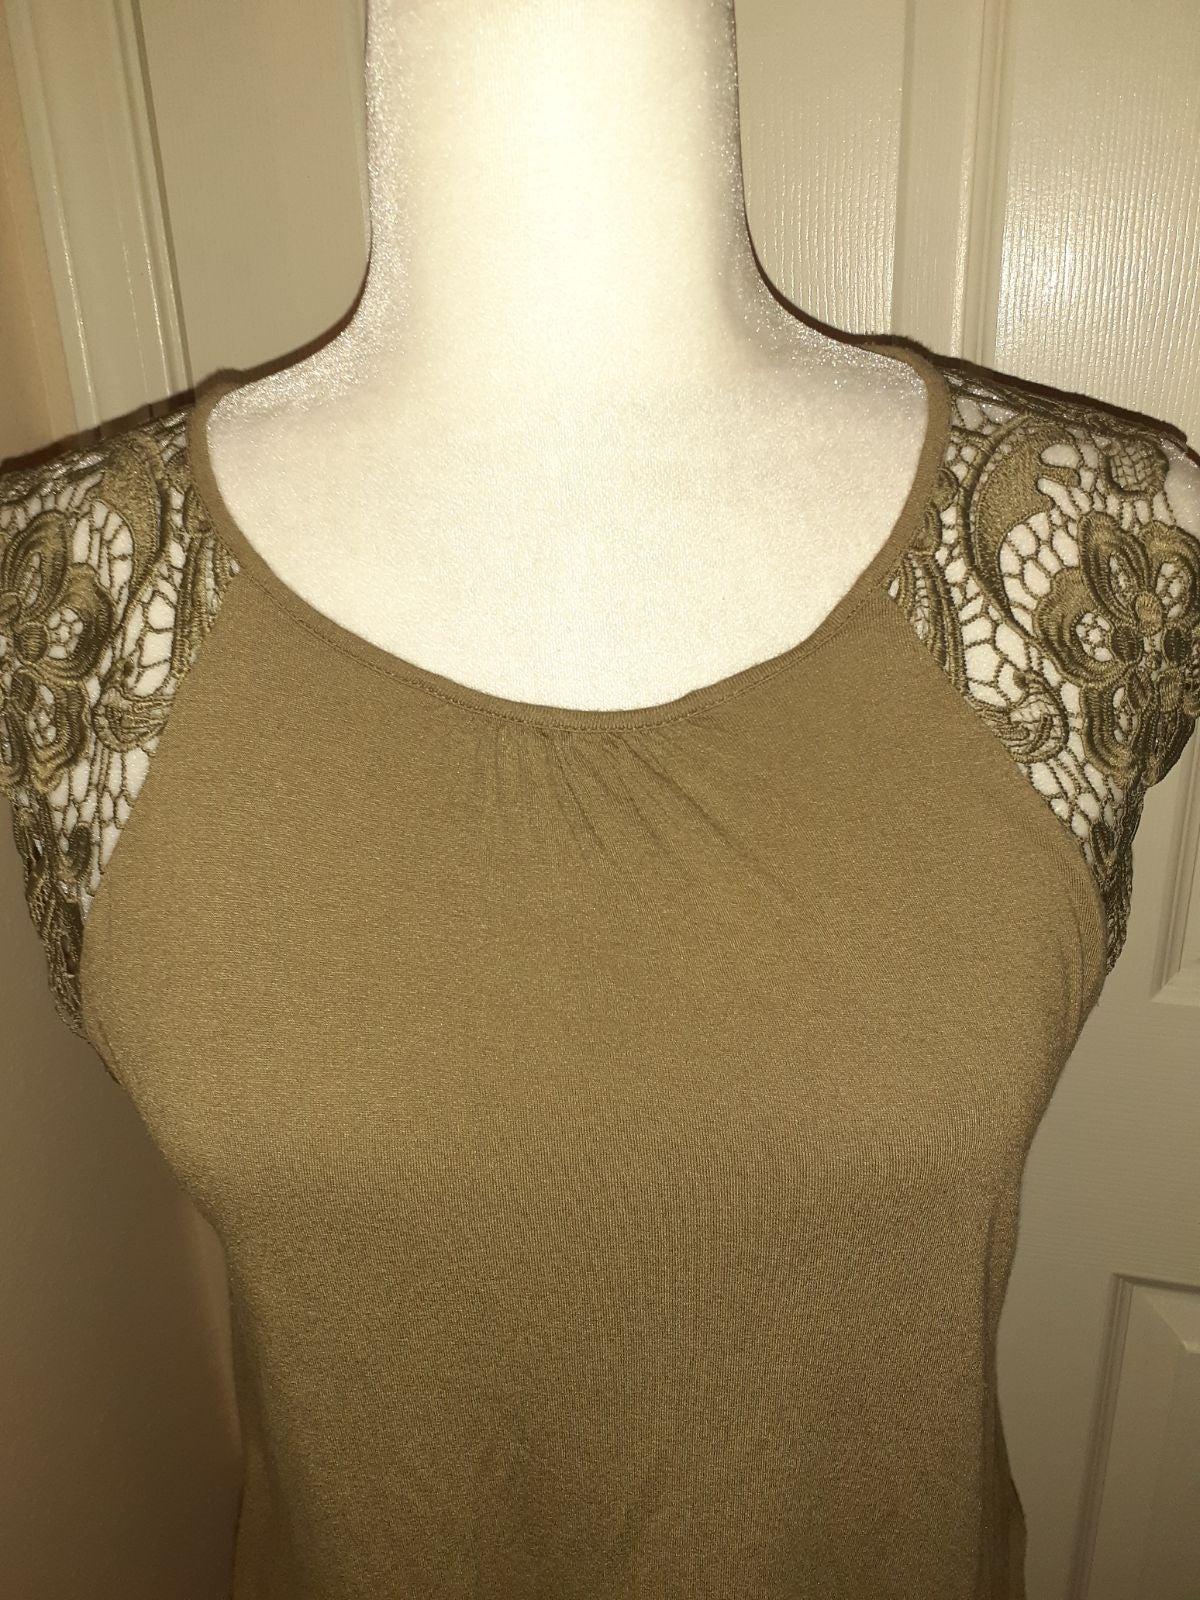 H&M women's medium boho shirt lace